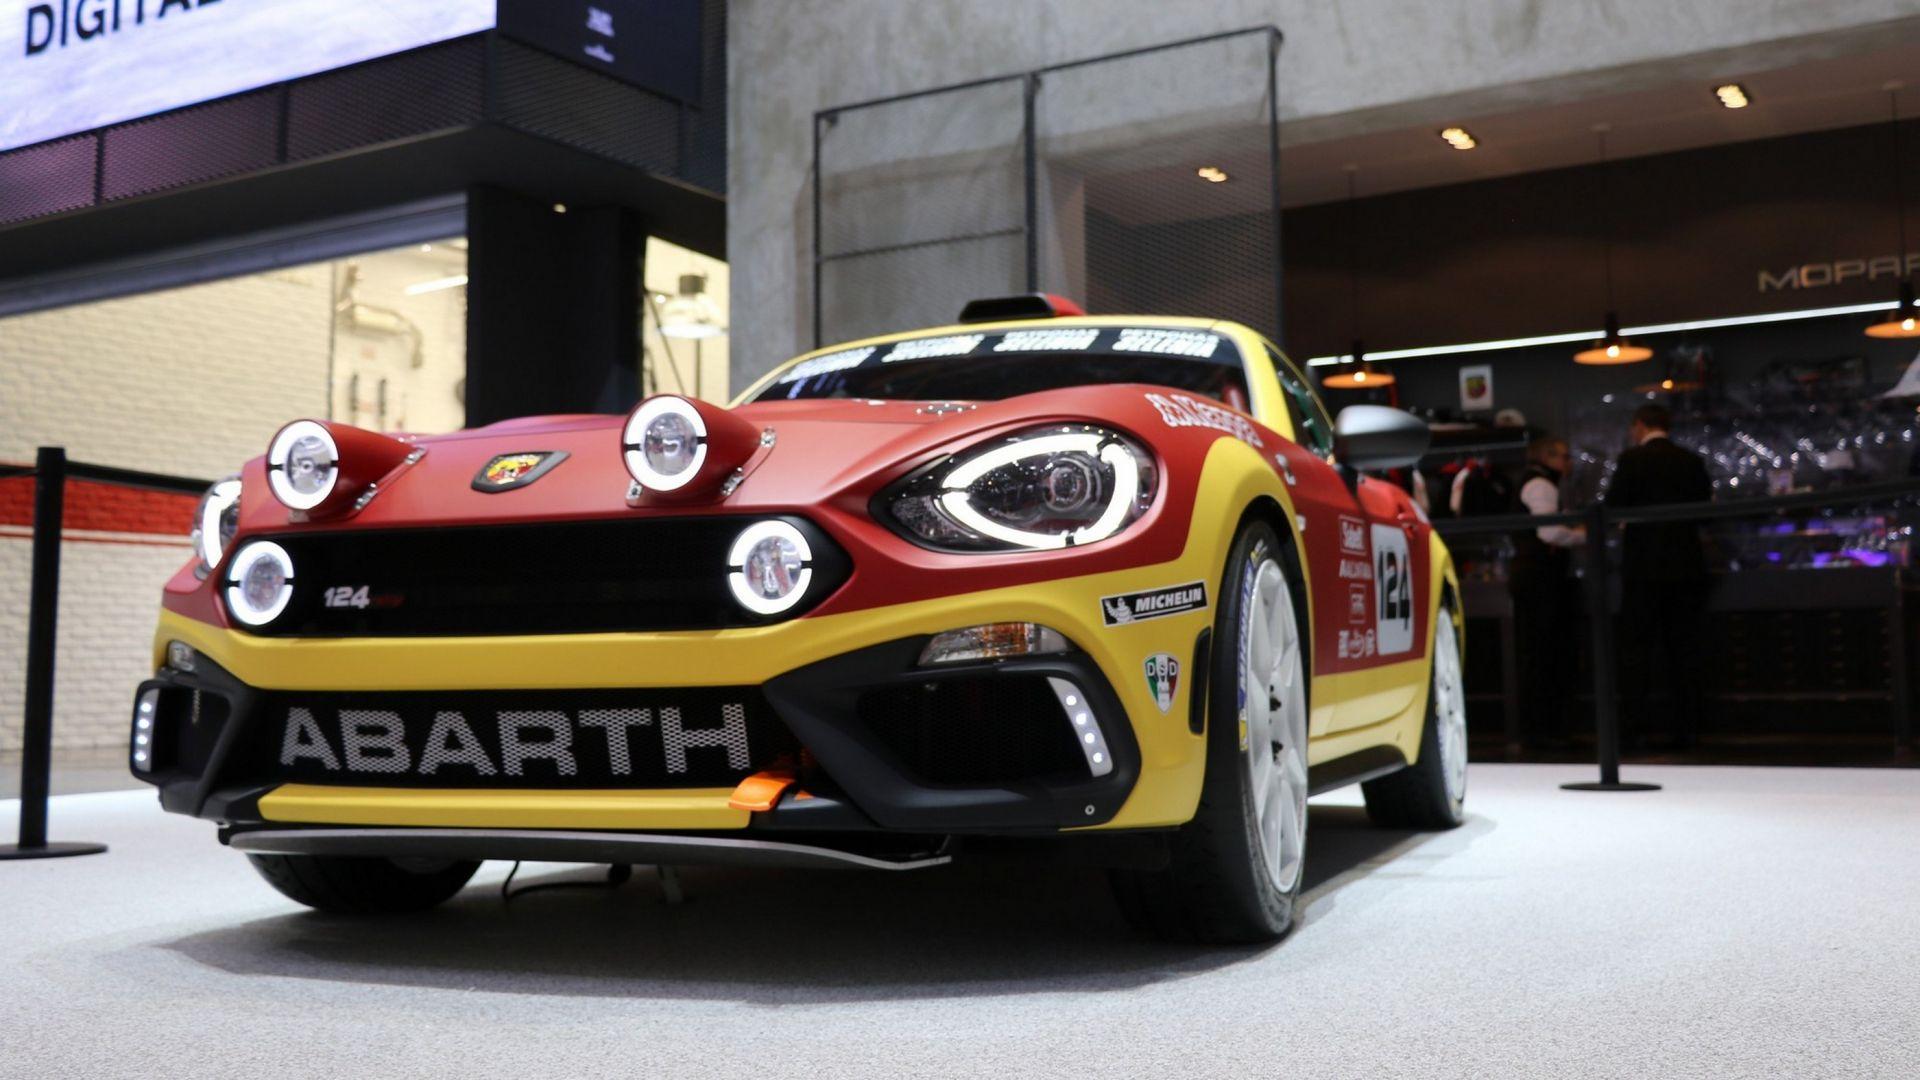 rally abarth 124 rally lo scorpione con 300 cv motorbox. Black Bedroom Furniture Sets. Home Design Ideas